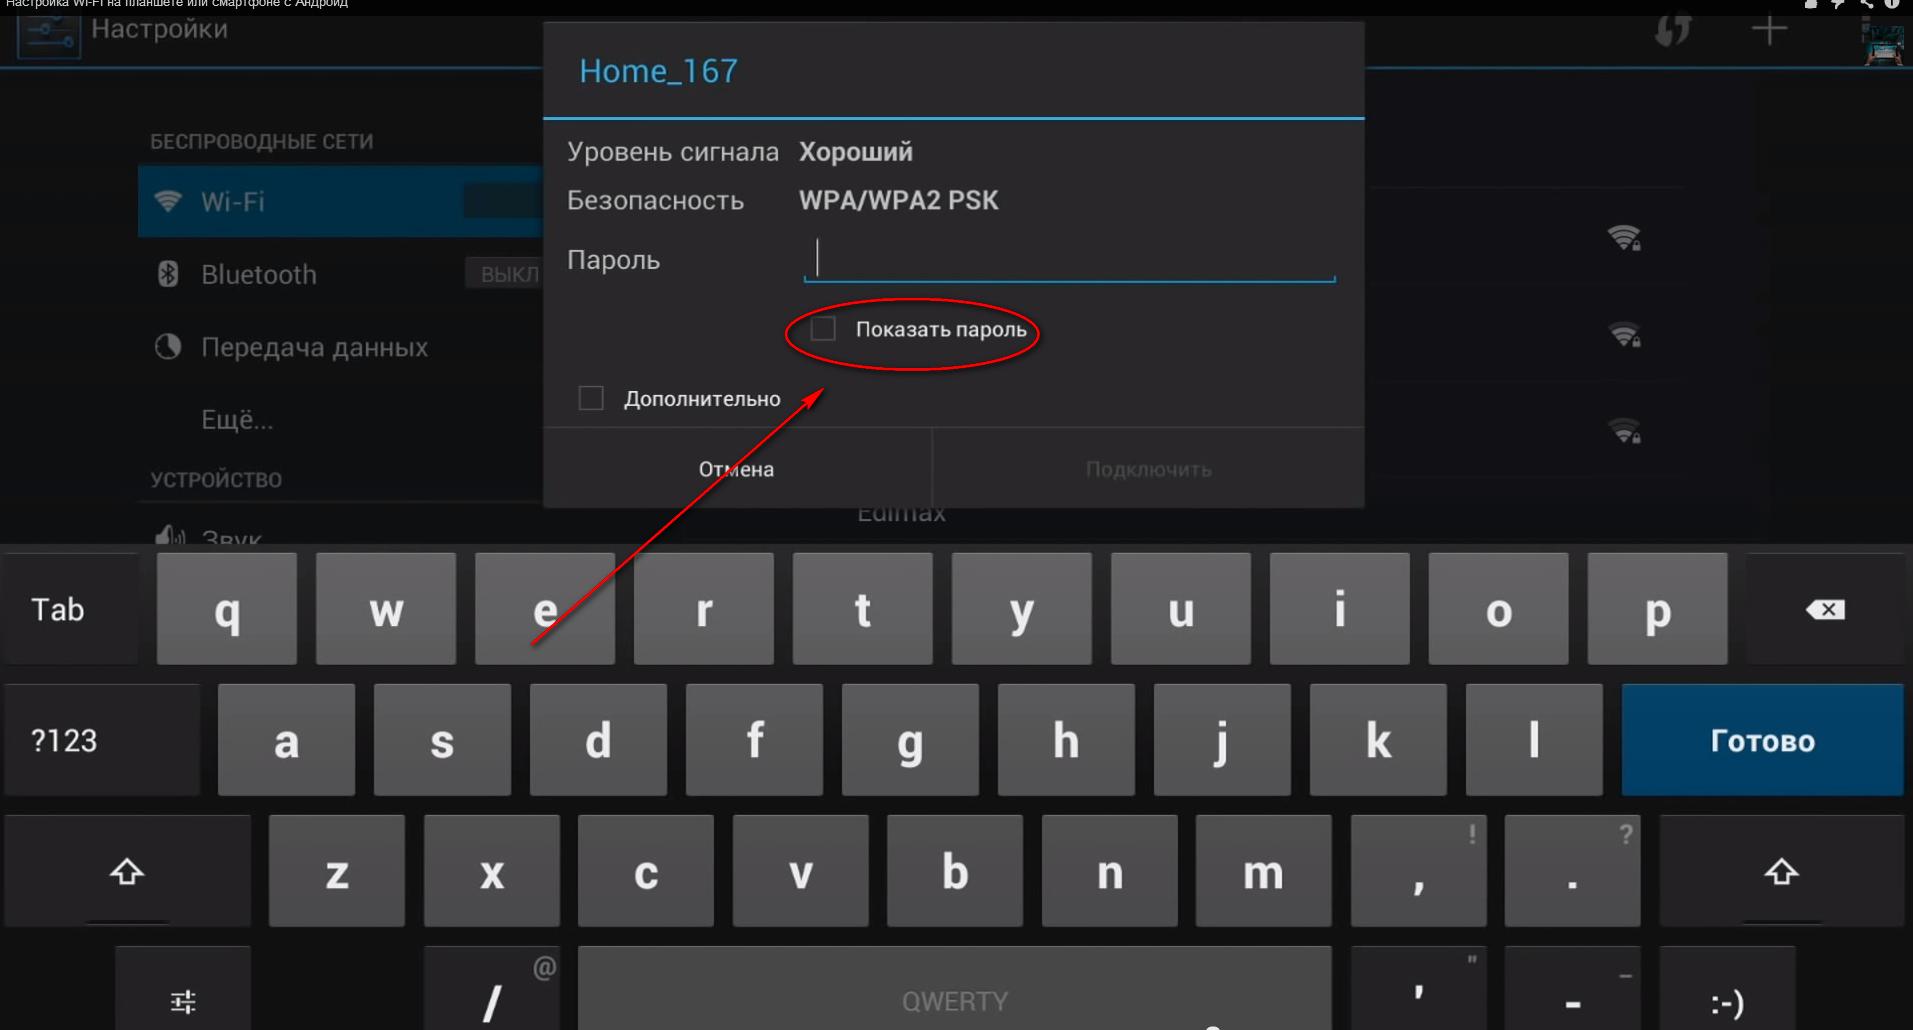 Ввод пароля на планшете